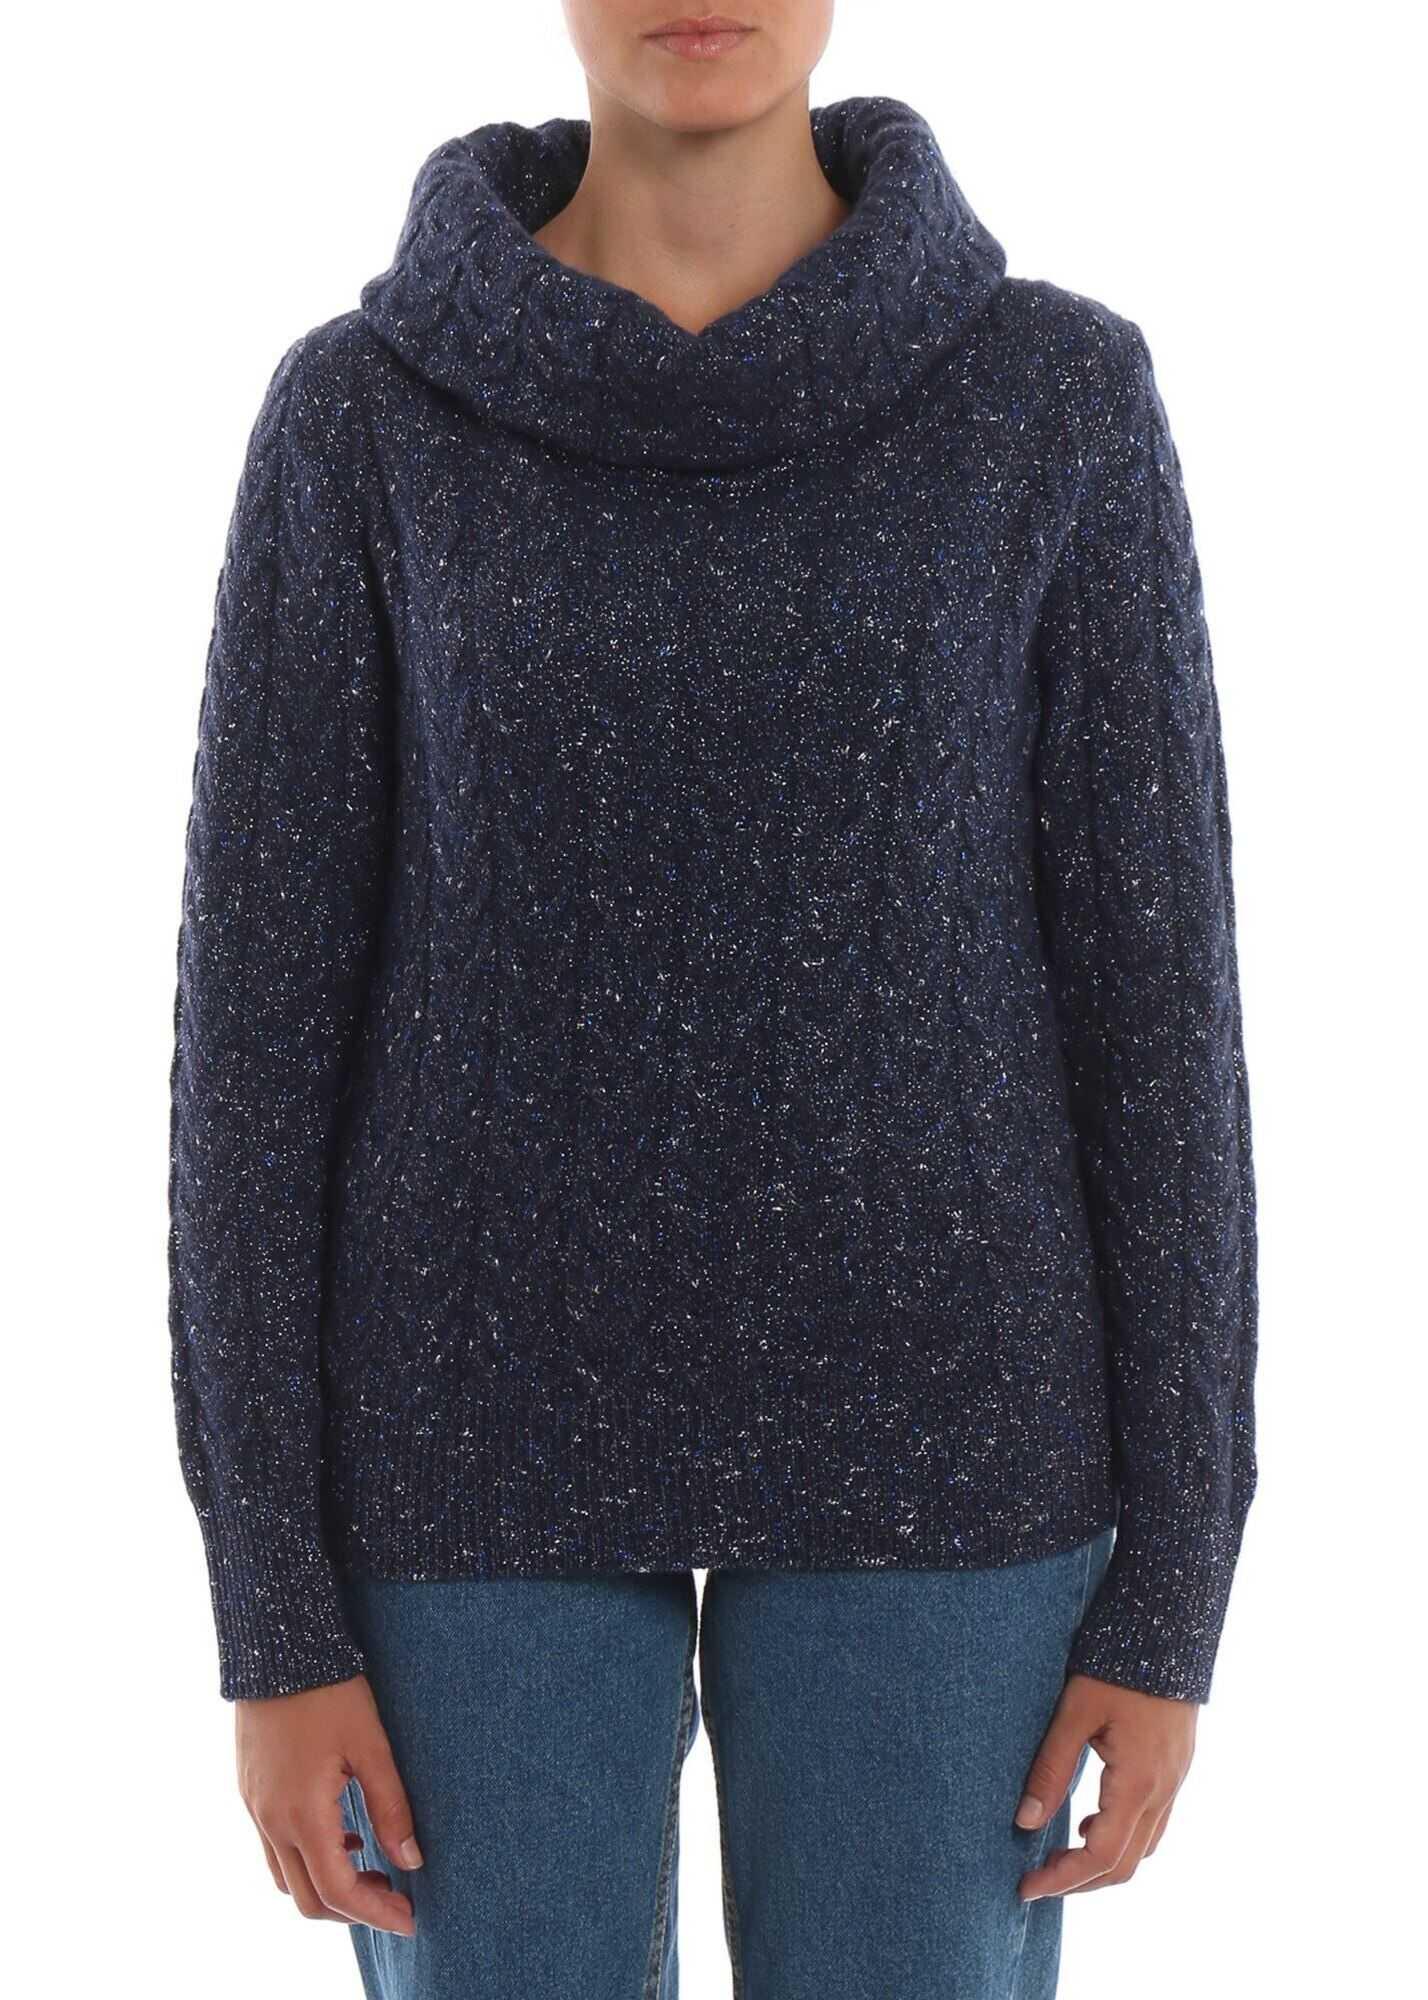 Blumarine Wool And Lurex Blend Sweater Blue